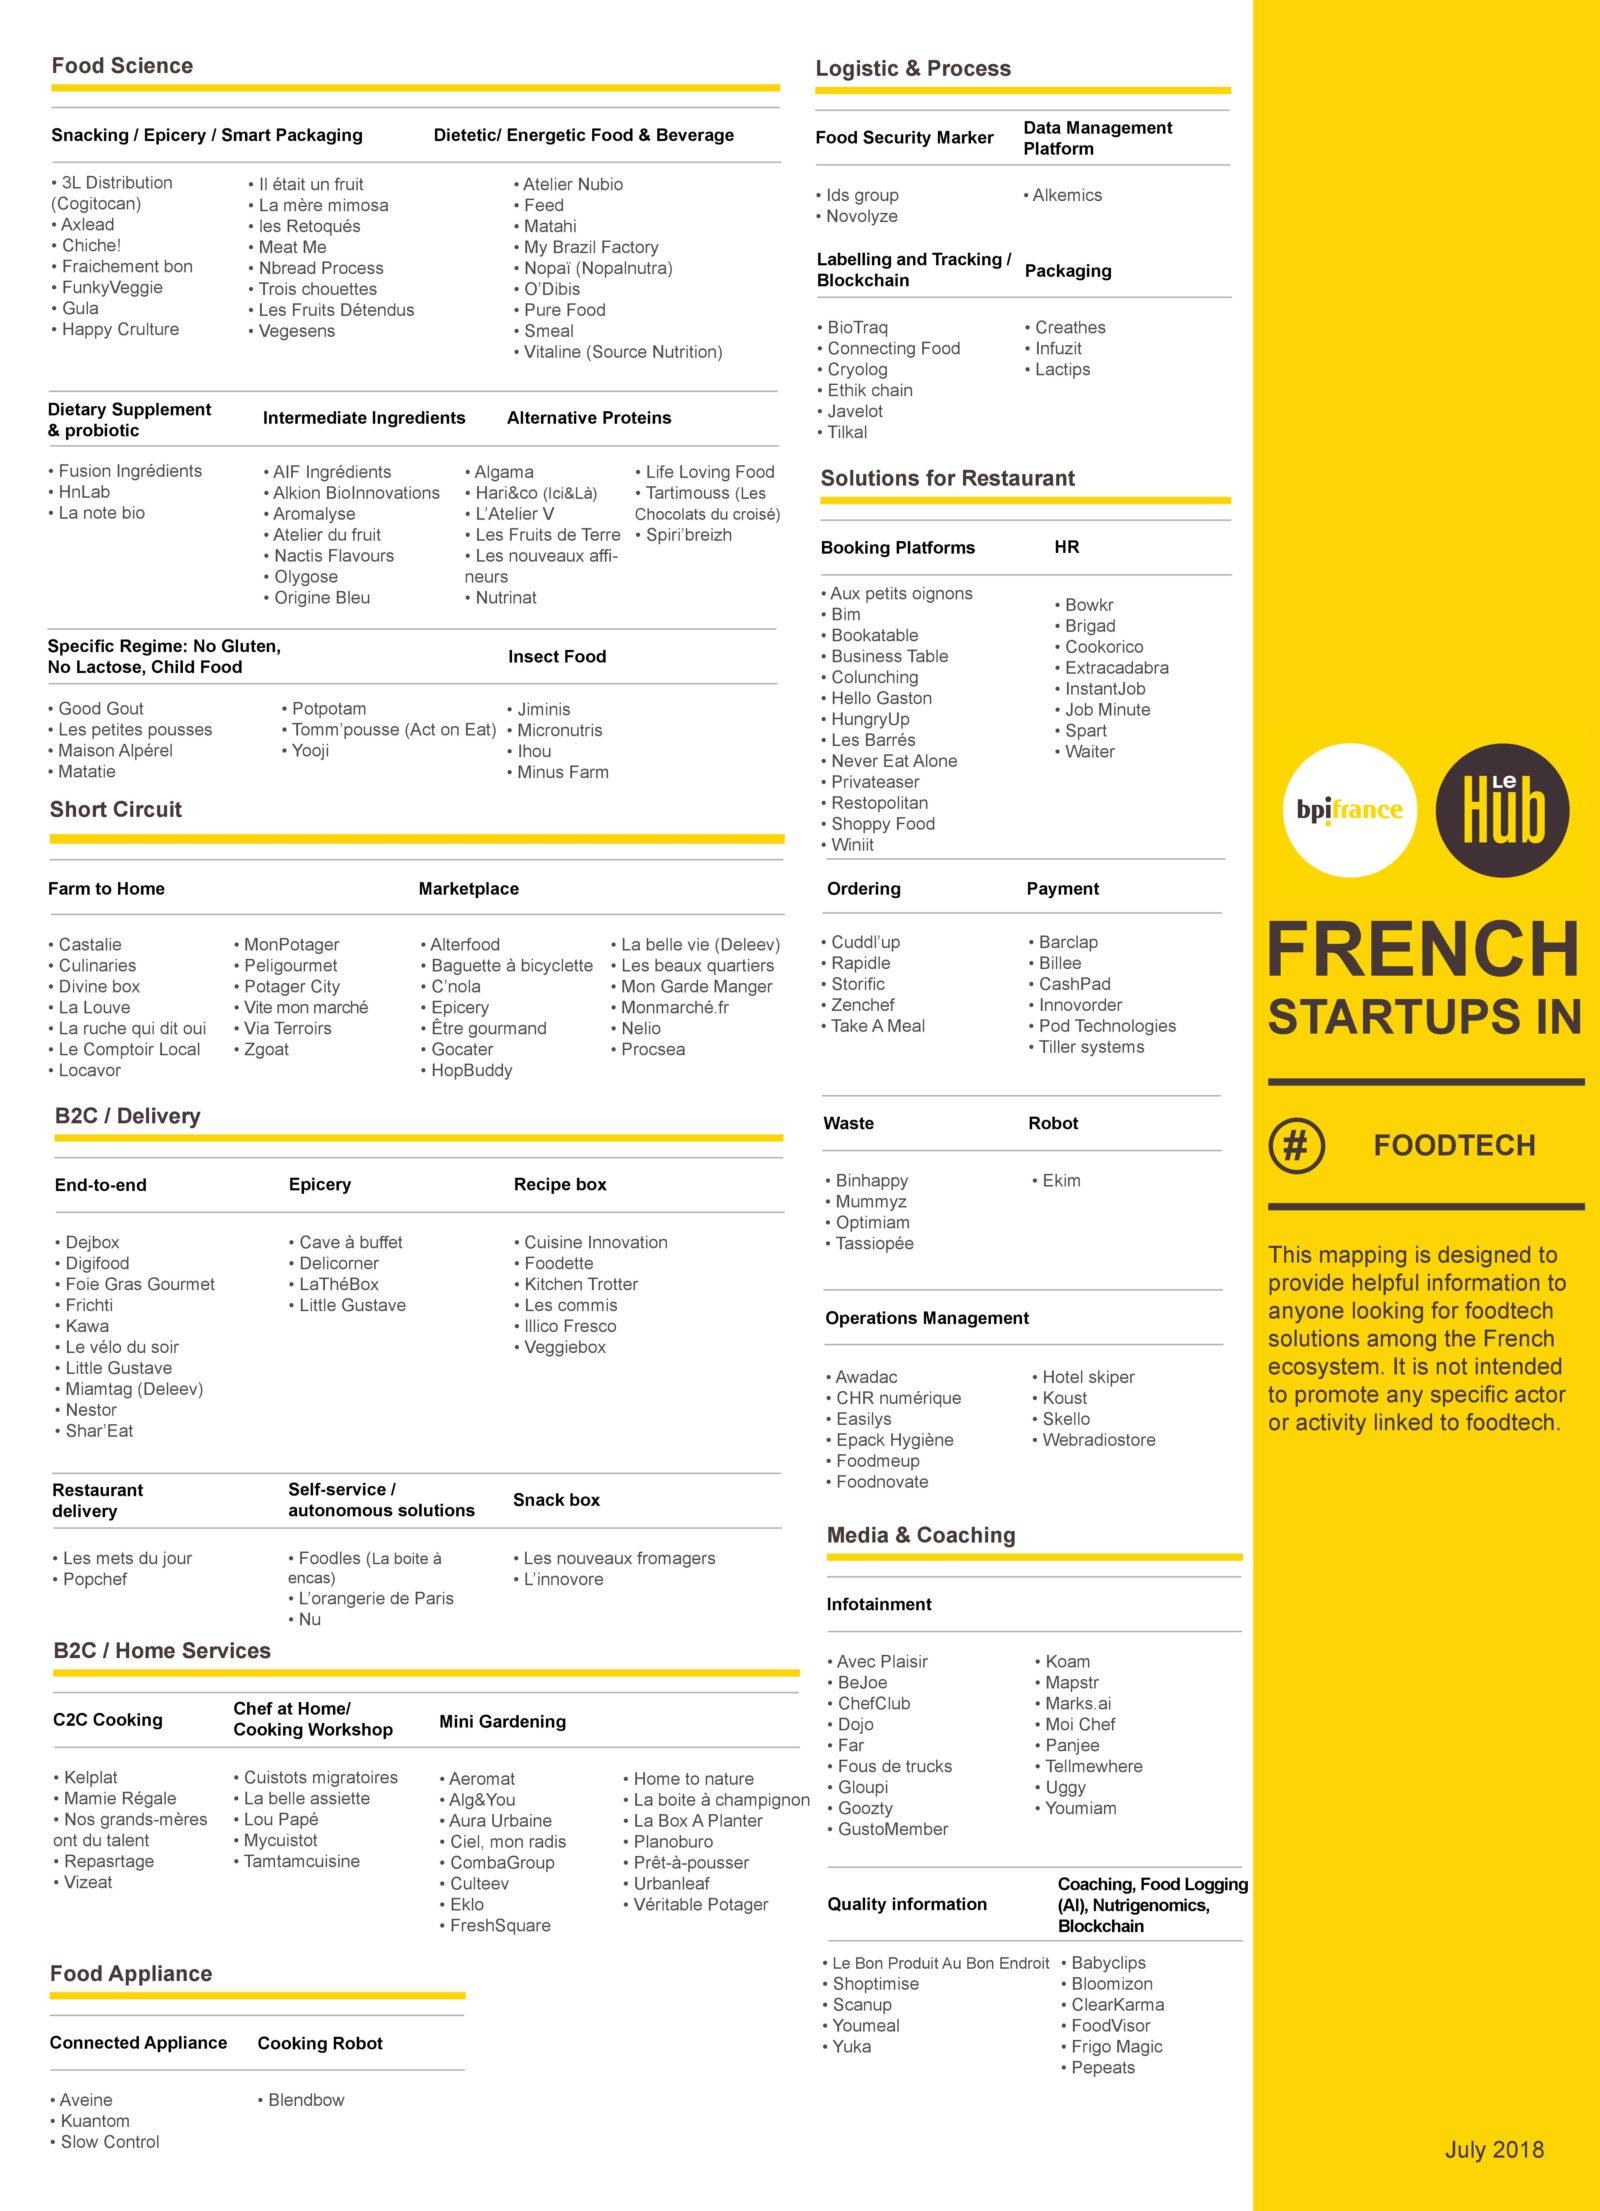 mapping foodtech bpifrancelehub V3 1600x2211 - Panorama de la Foodtech française par BPI FRANCE - LE HUB